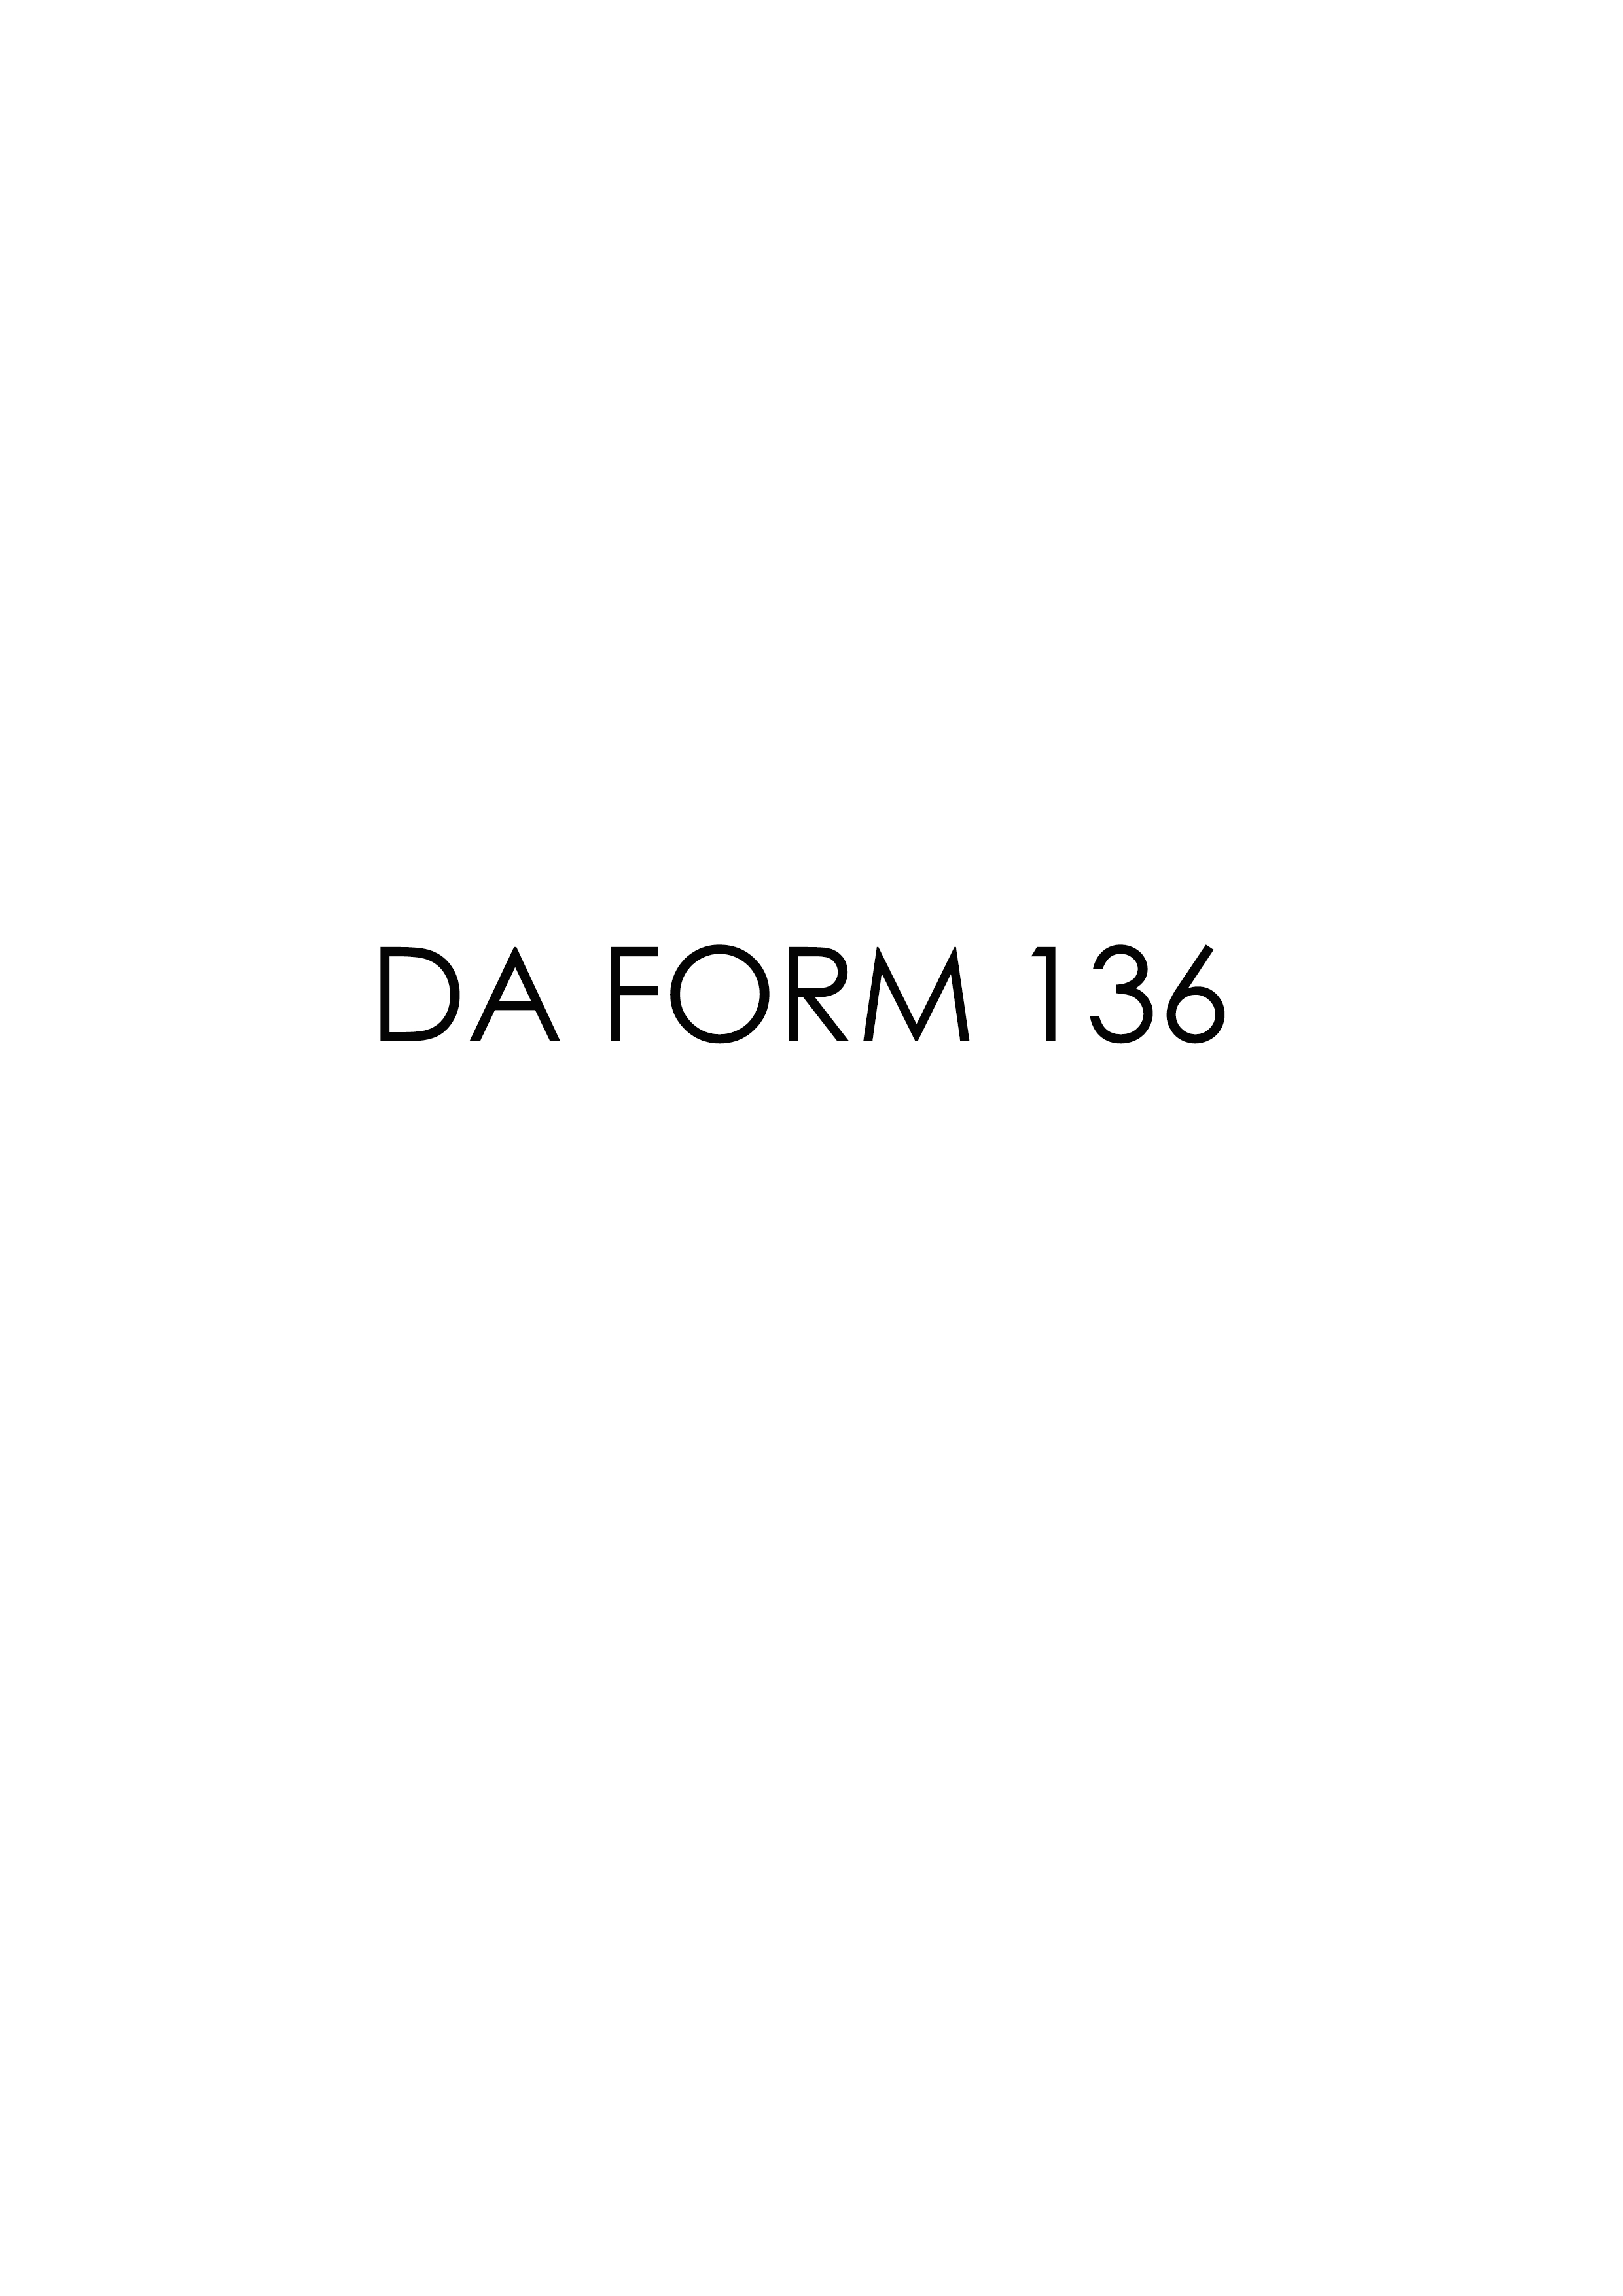 Download da Form 136 Free